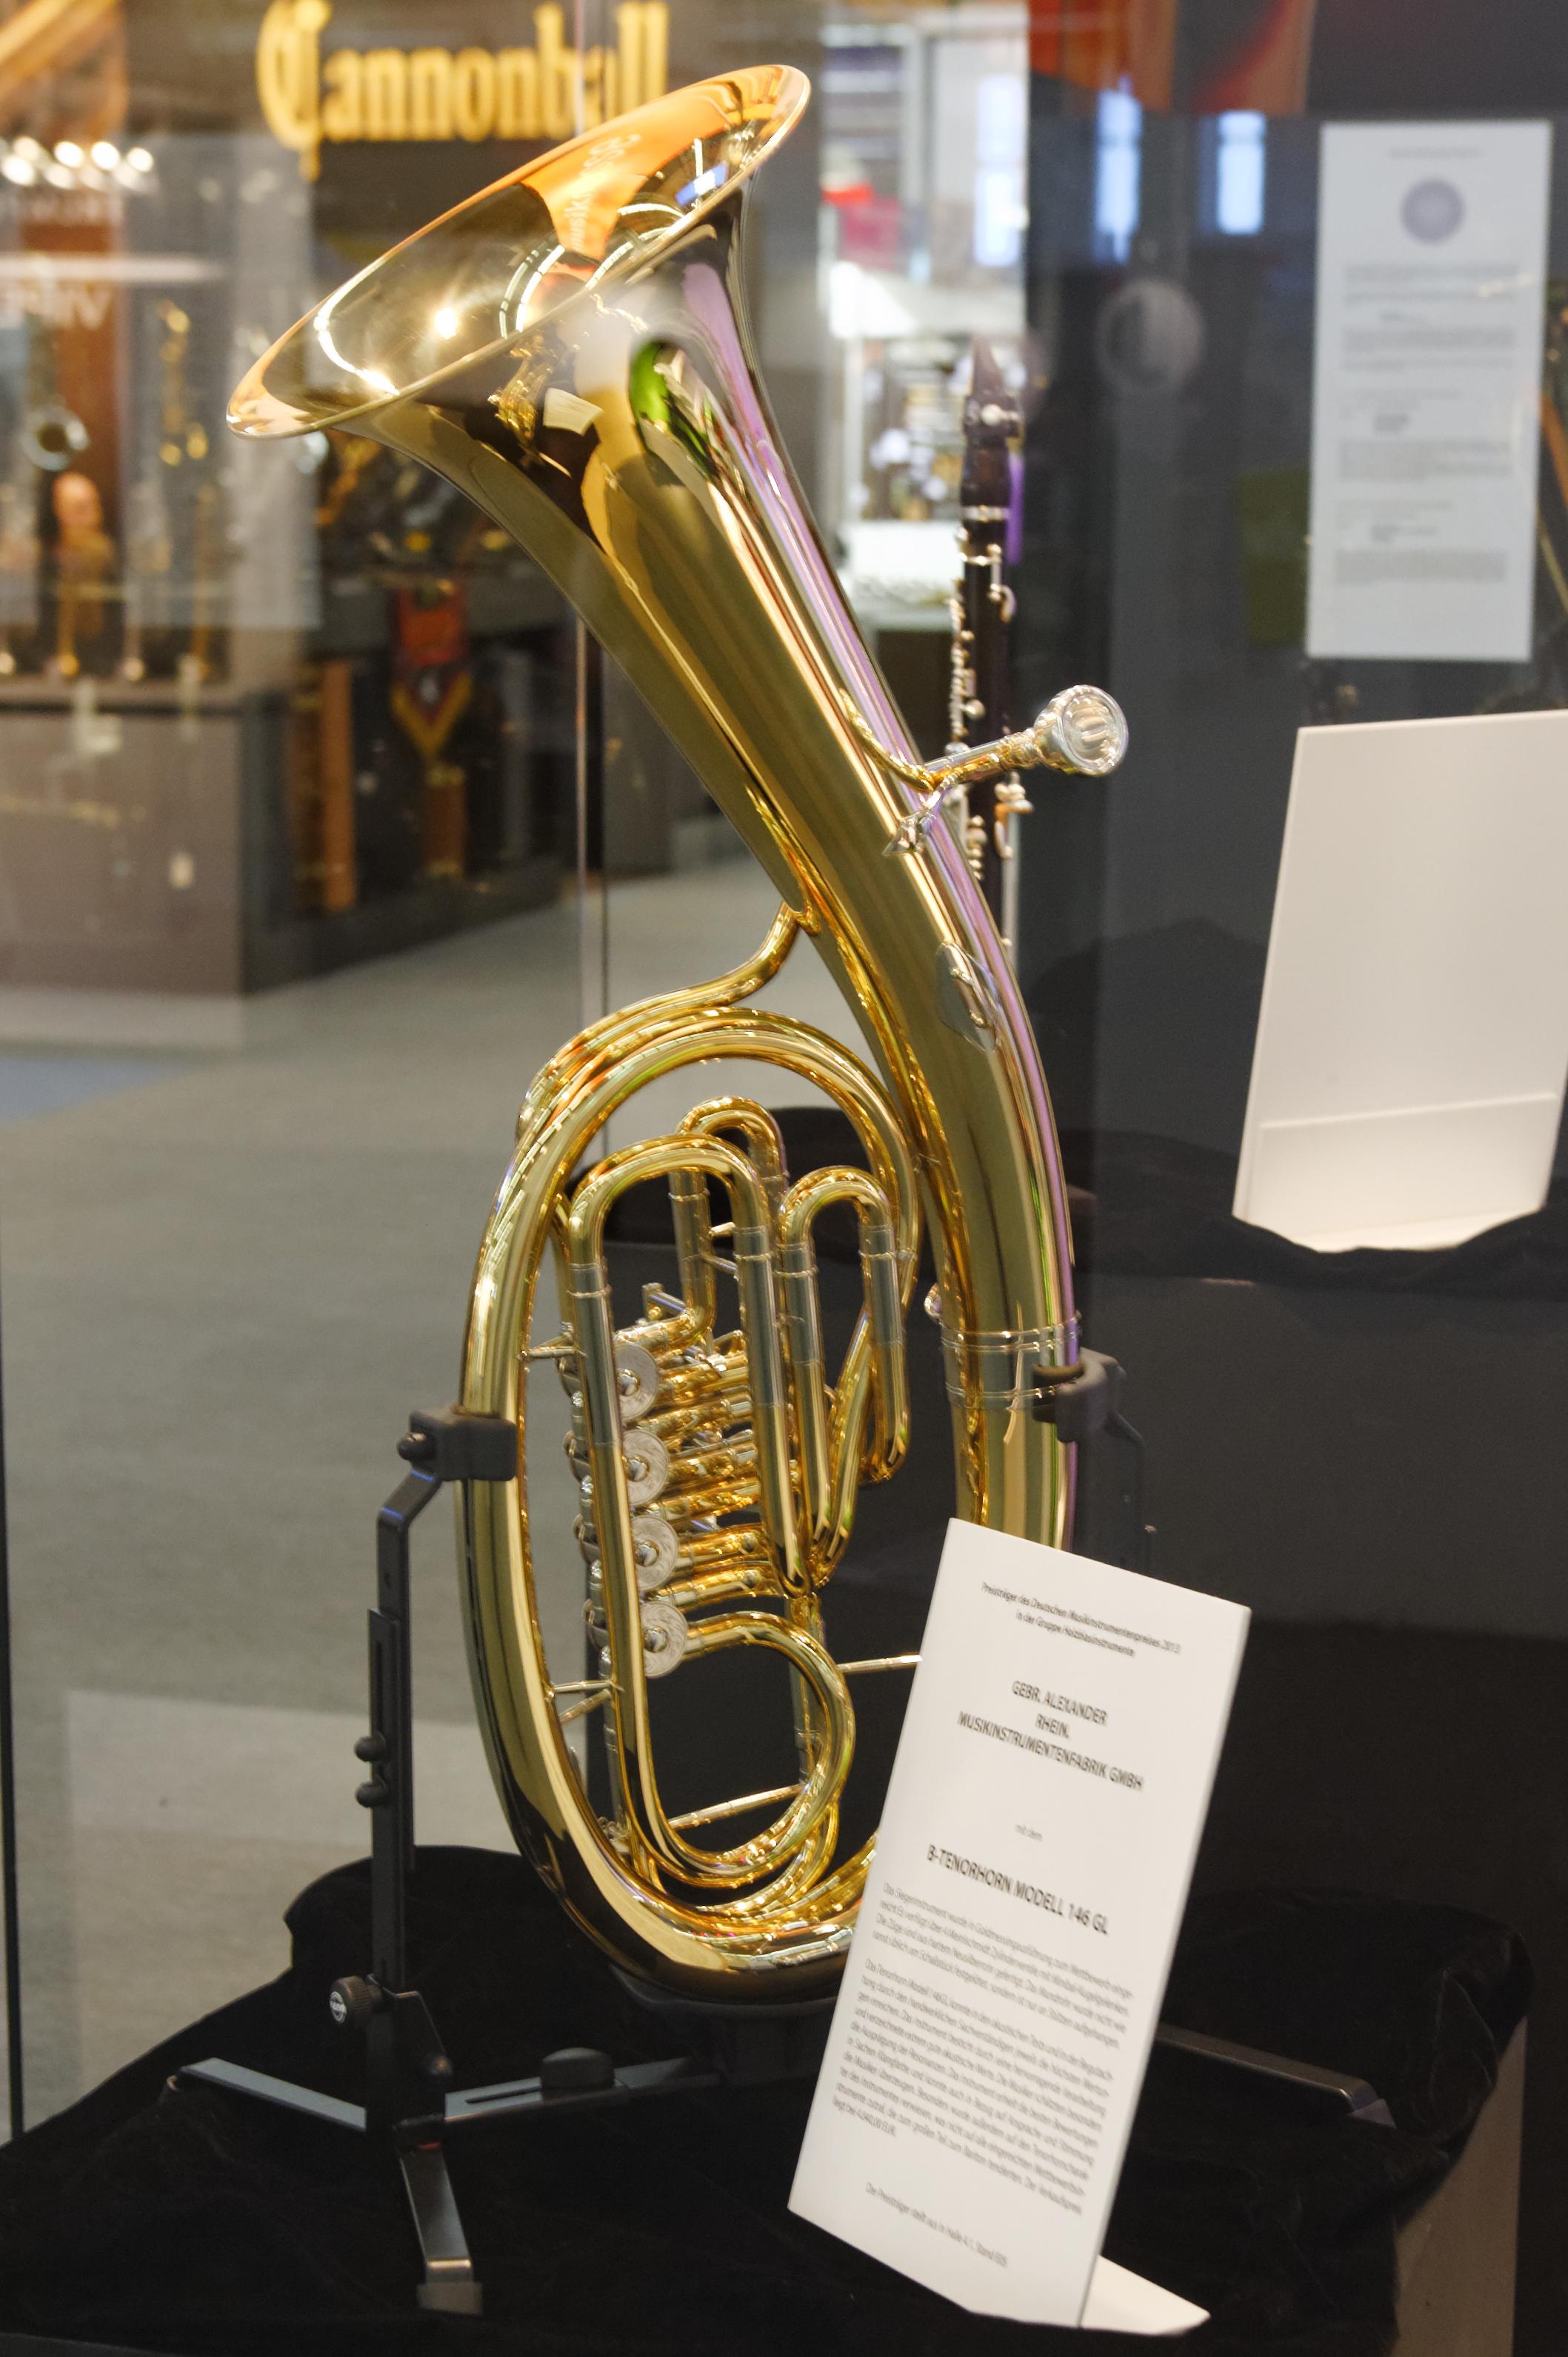 File Musikmessefrankfurt2017 B Tenorhorn 146 Gl 038 Jpg Wikimedia